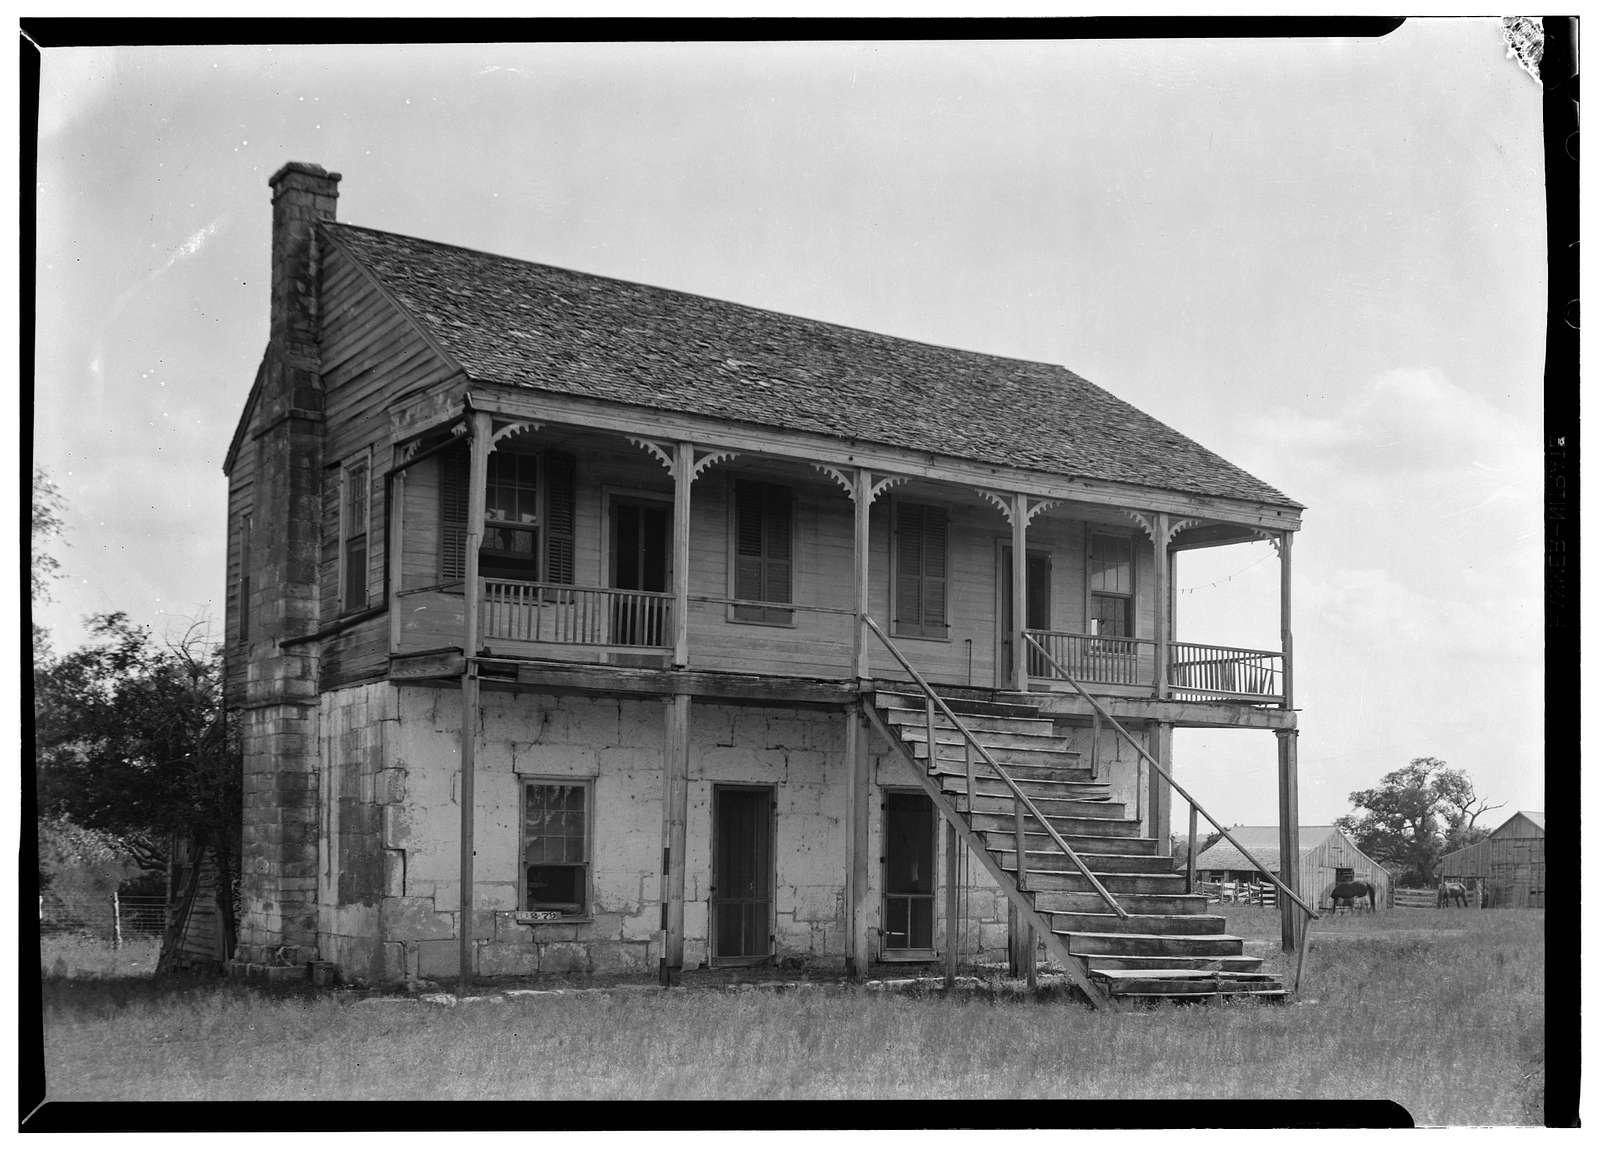 Thomas Murphree House, Thomaston, De Witt County, TX